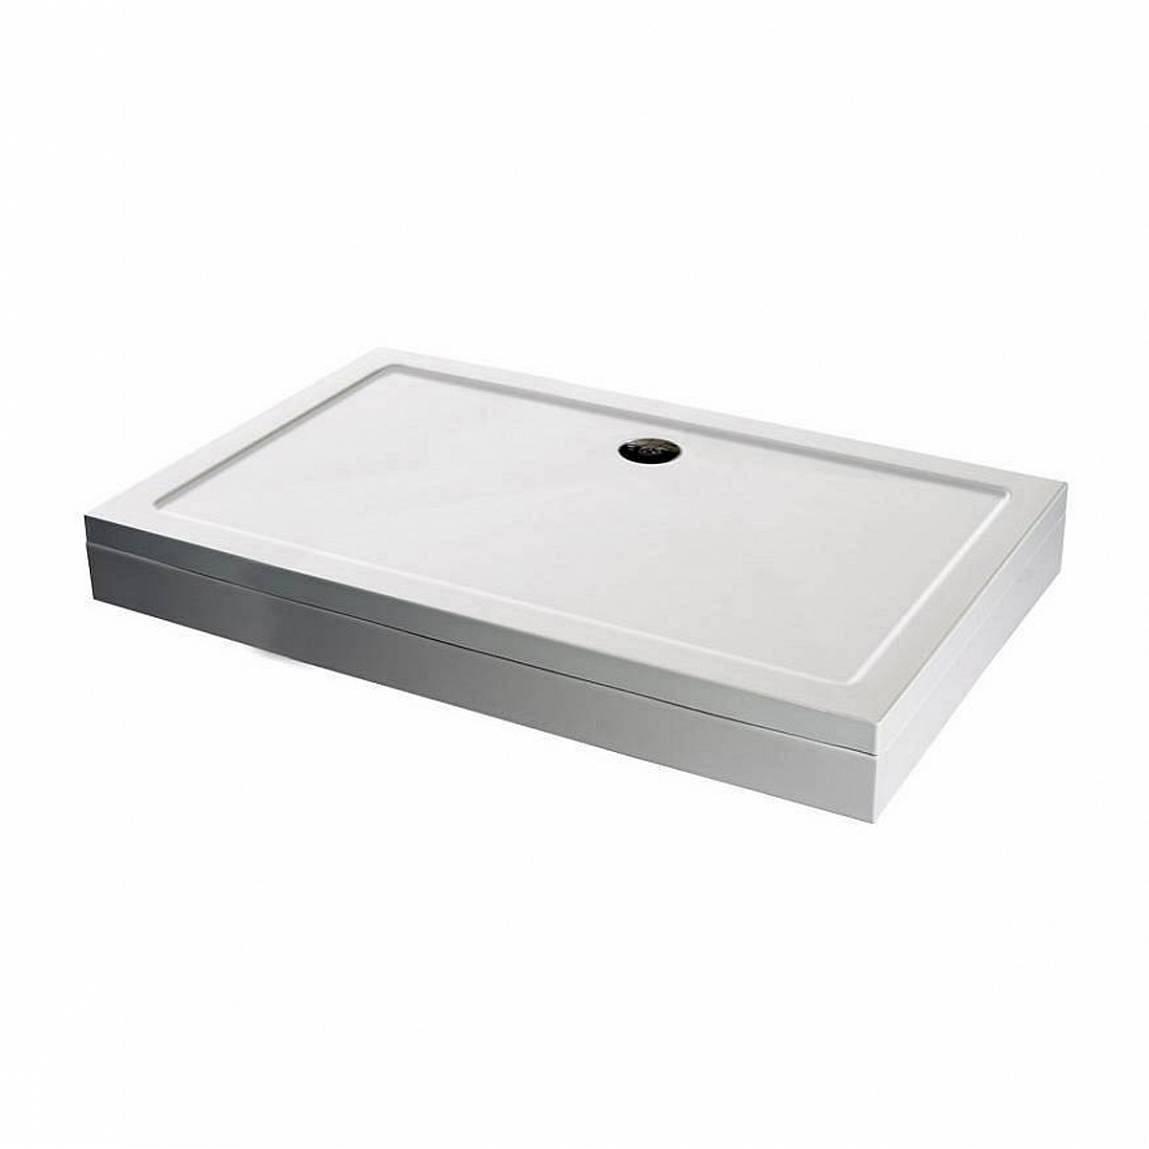 Image of Rectangular Stone Shower Tray & Riser Kit 1400 x 760